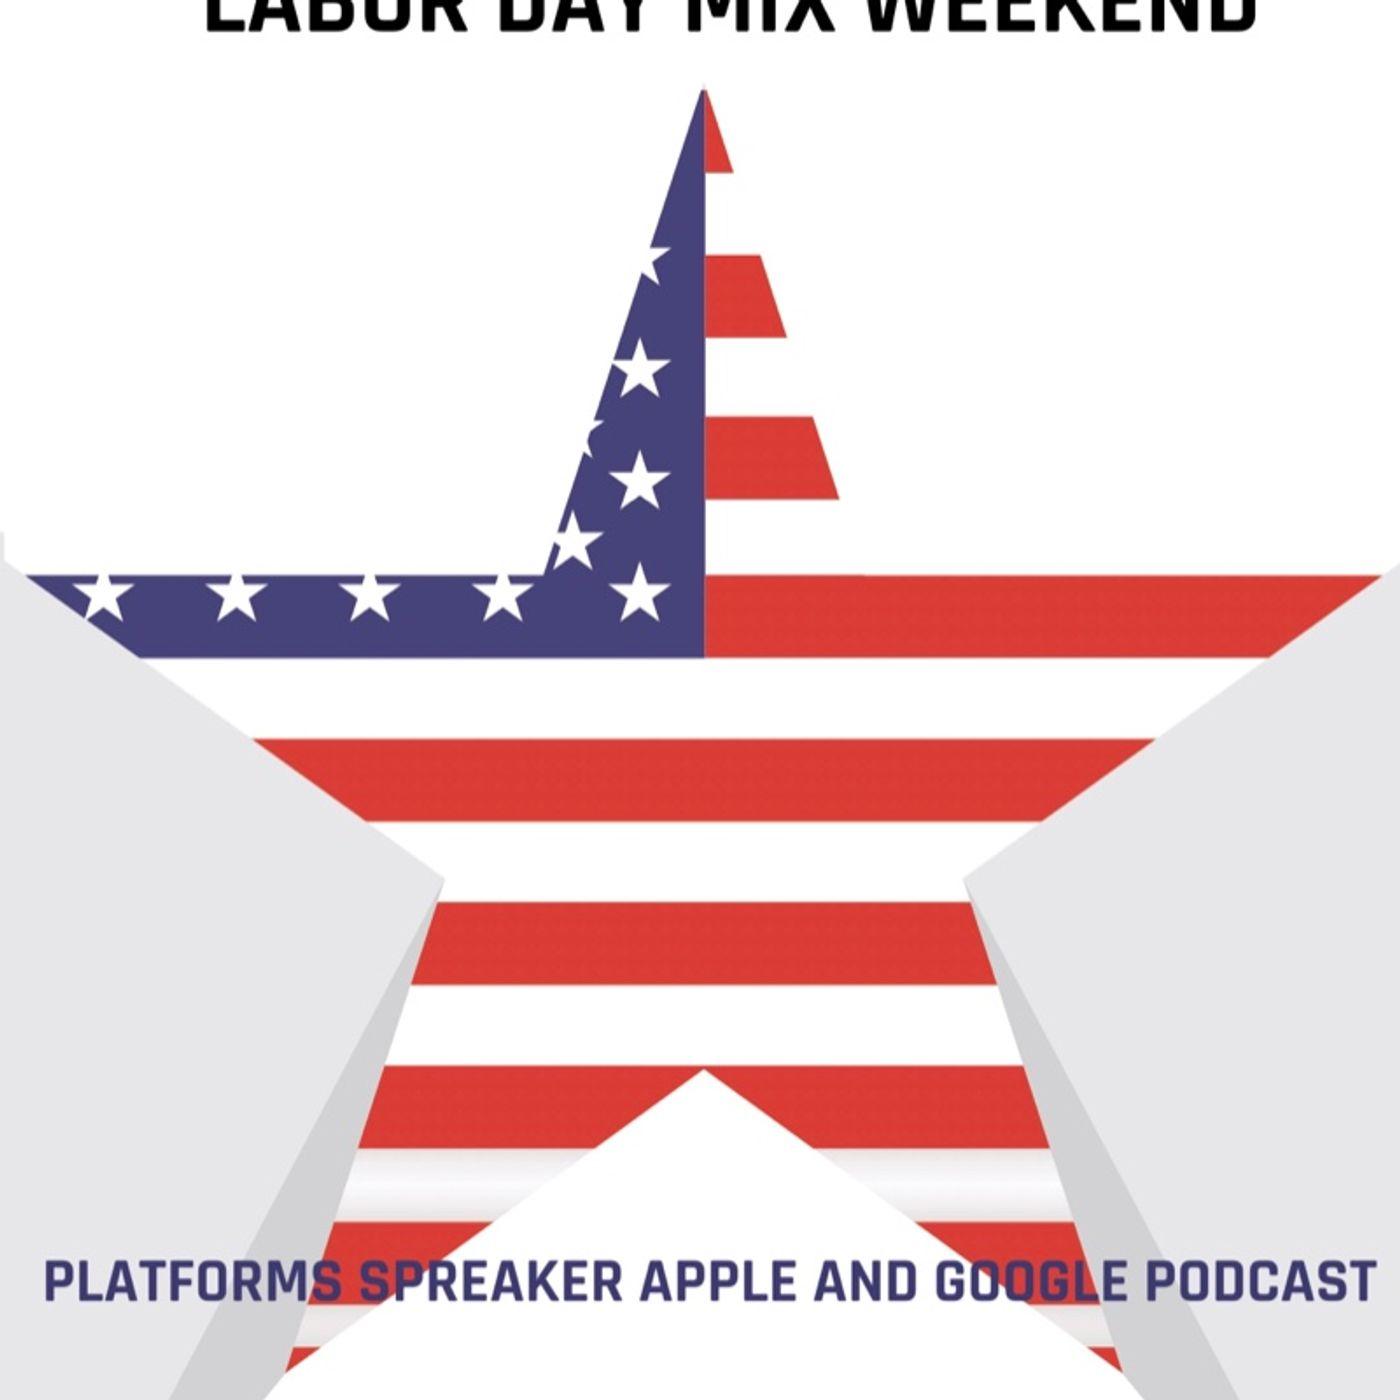 Episode 222 - Main Event Mix Weekend